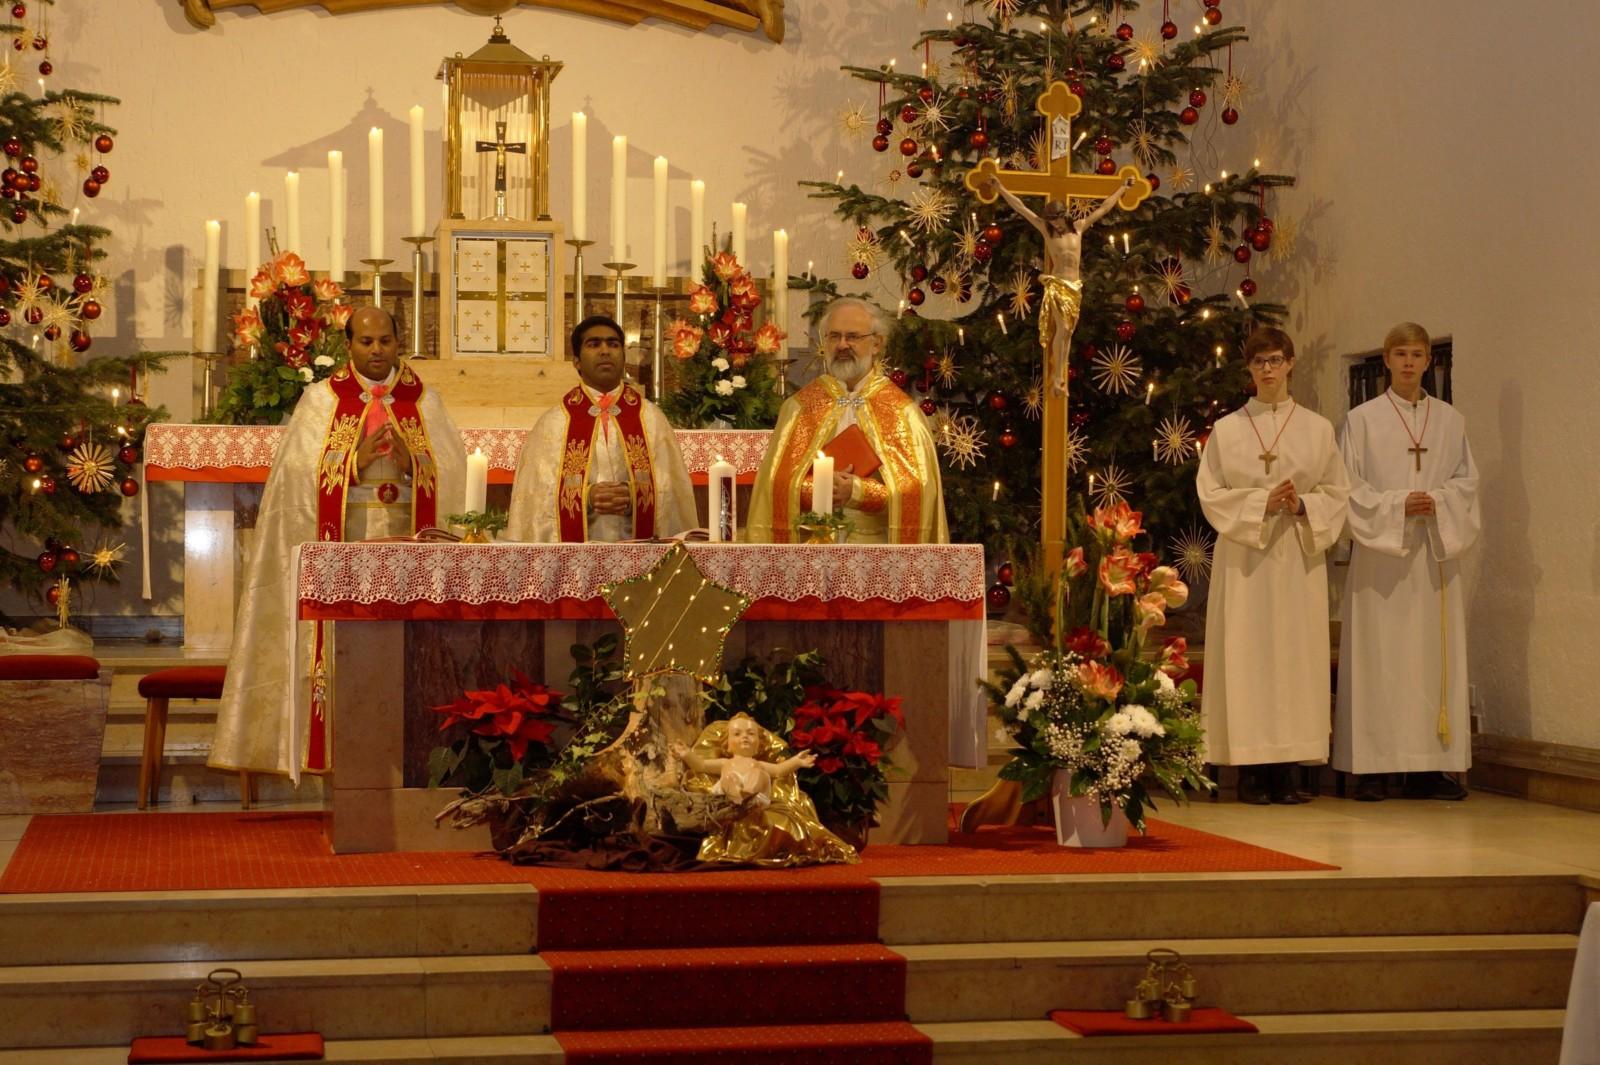 20181230-10 Jahre Priester Joseph DSC03750